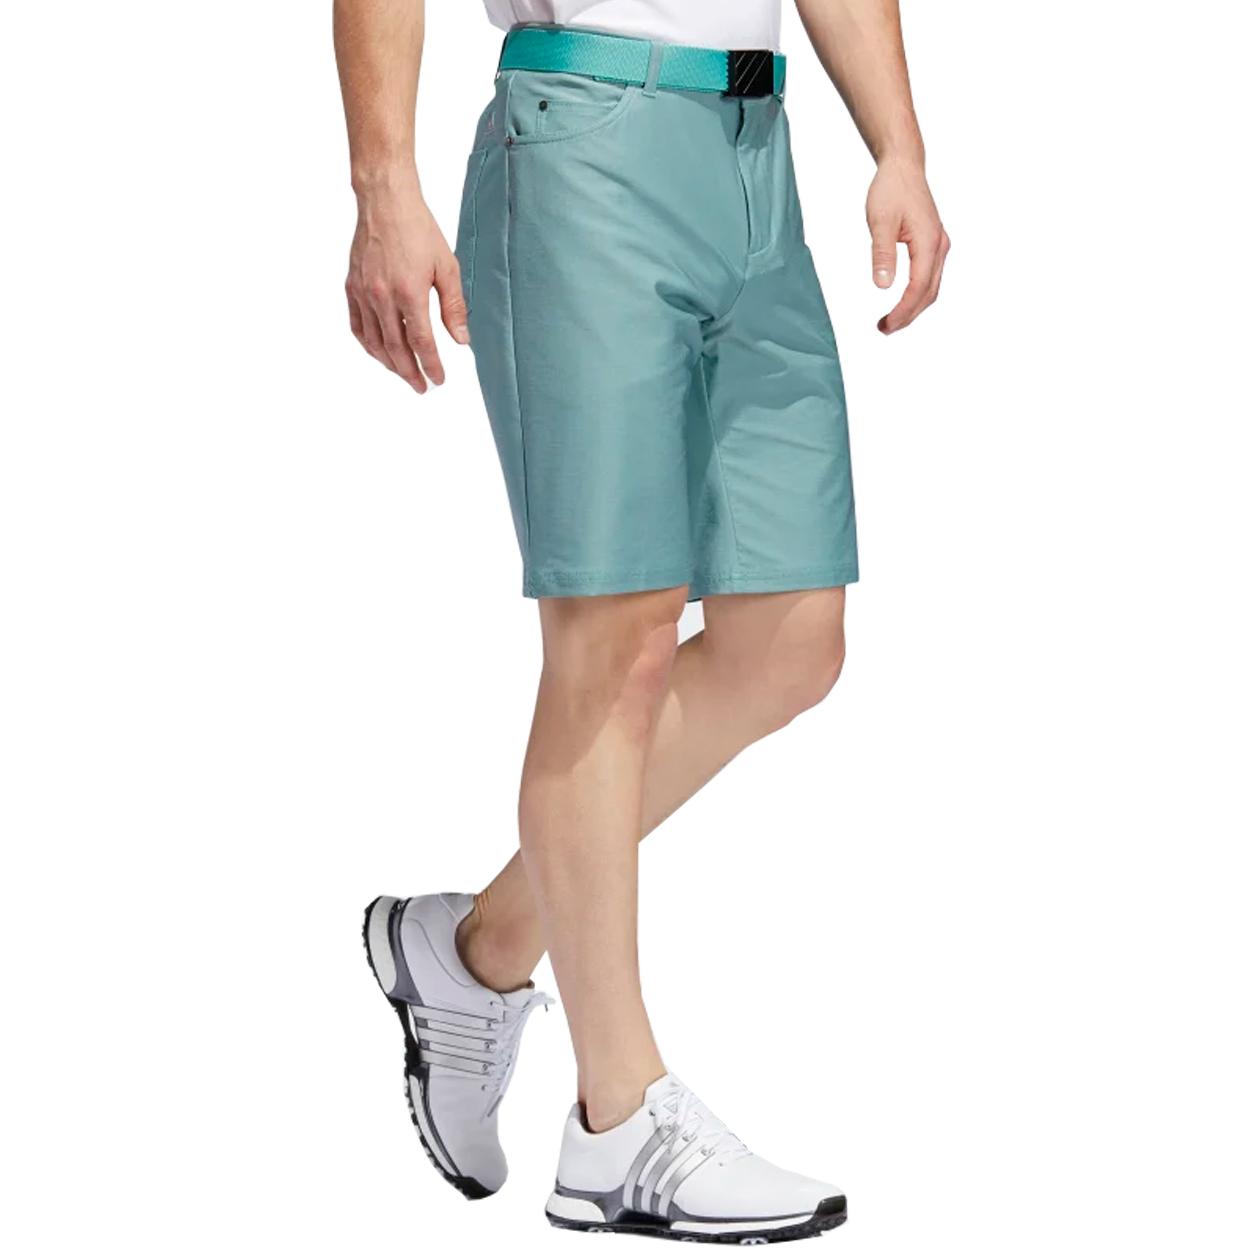 Adidas-Golf-Men-039-s-Ultimate365-Heather-5-Pocket-Shorts-Brand-New thumbnail 9